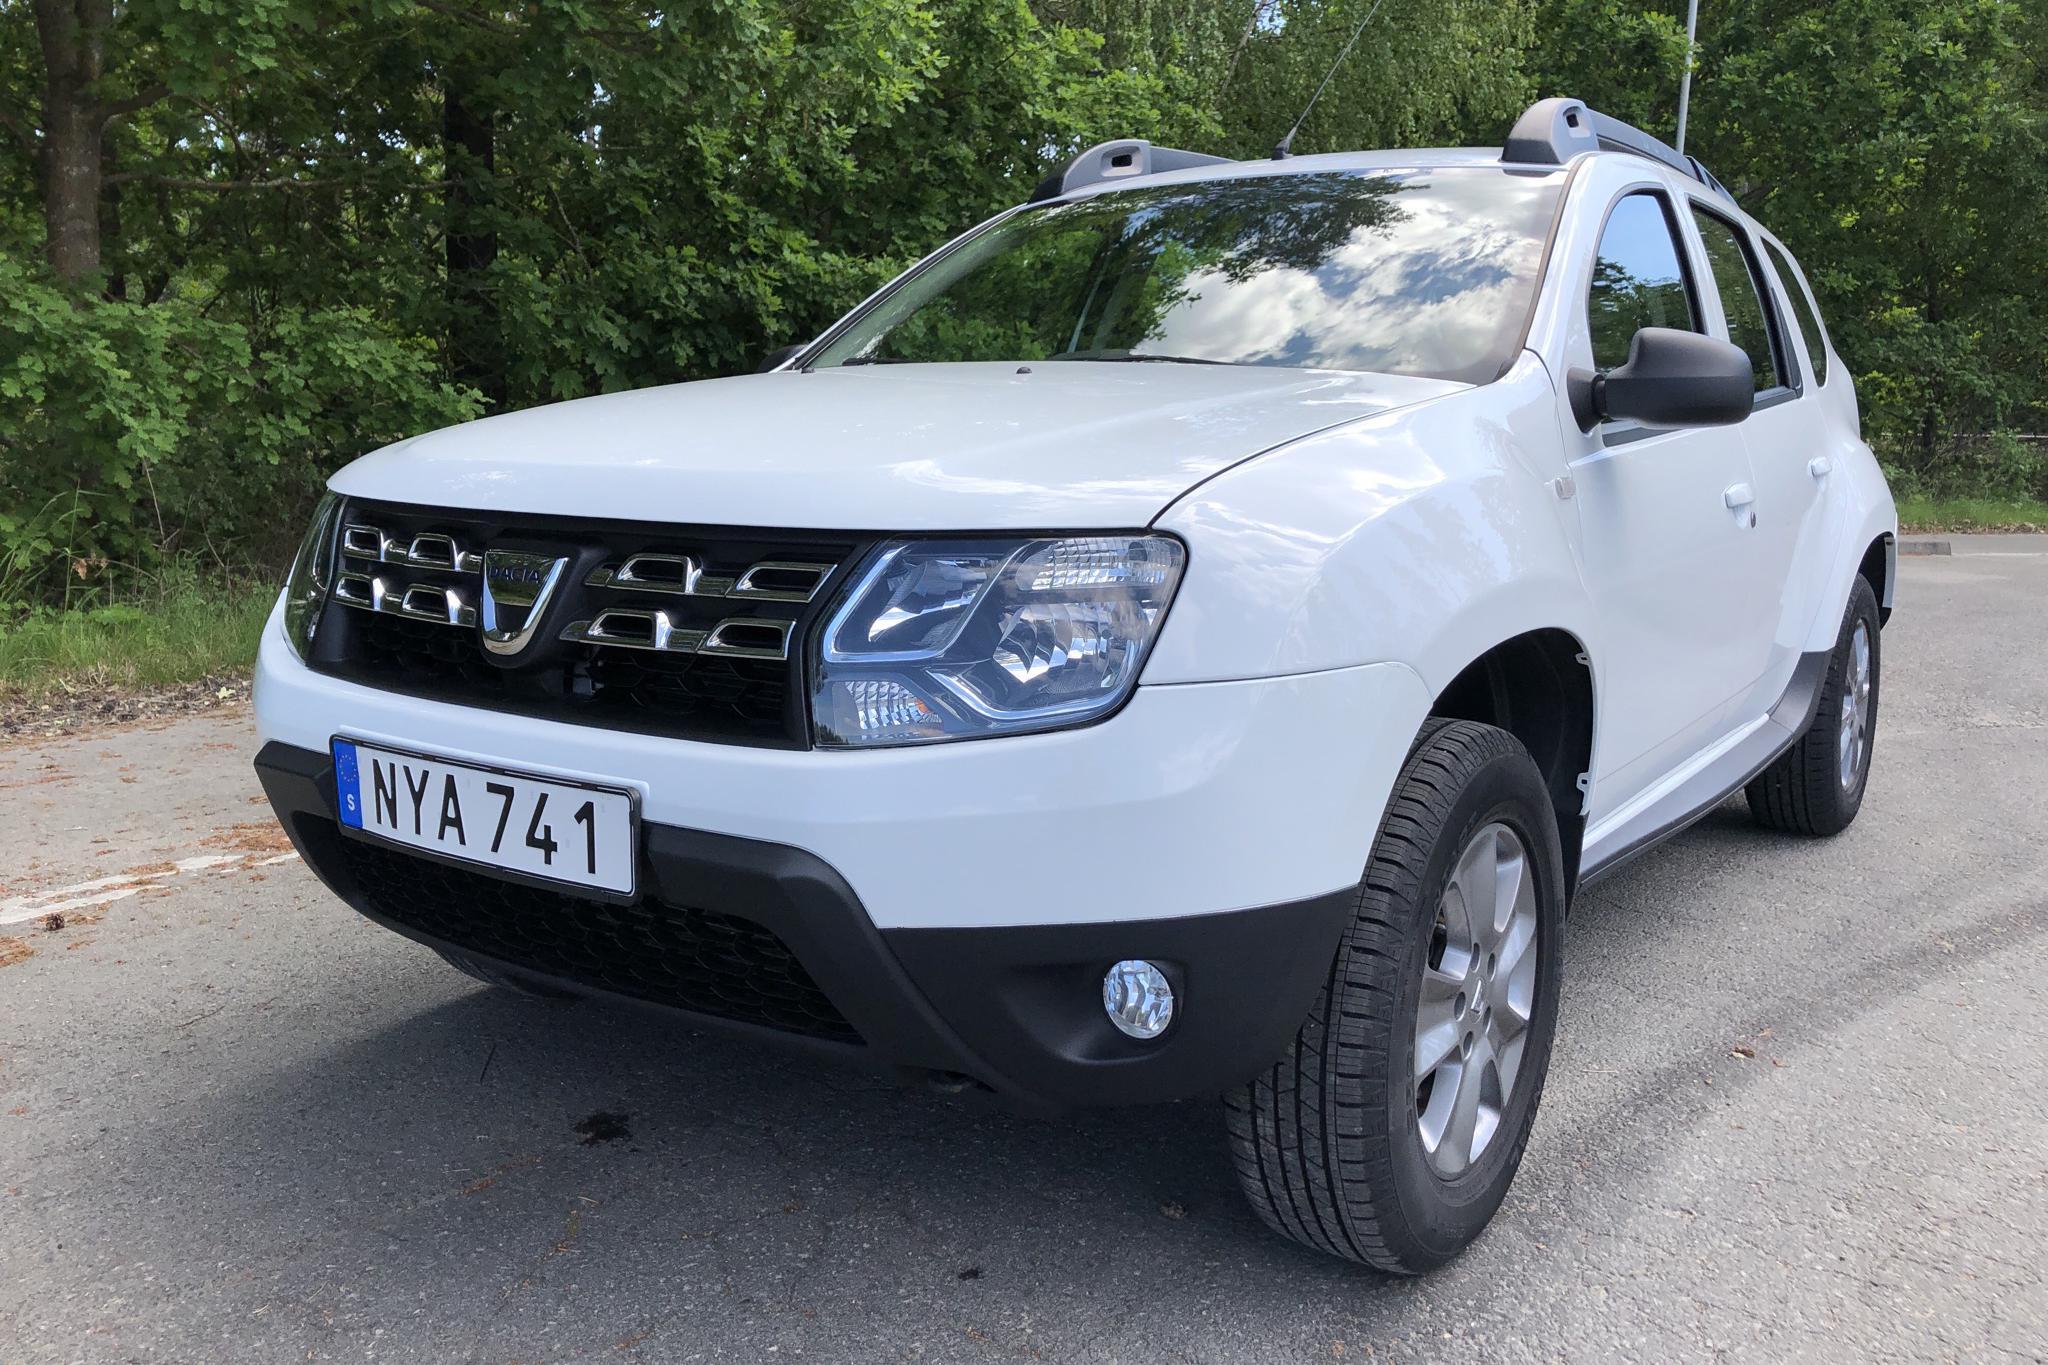 Dacia Duster 1.5 dCi 4x2 (109hk) - 2 870 mil - Manuell - vit - 2017